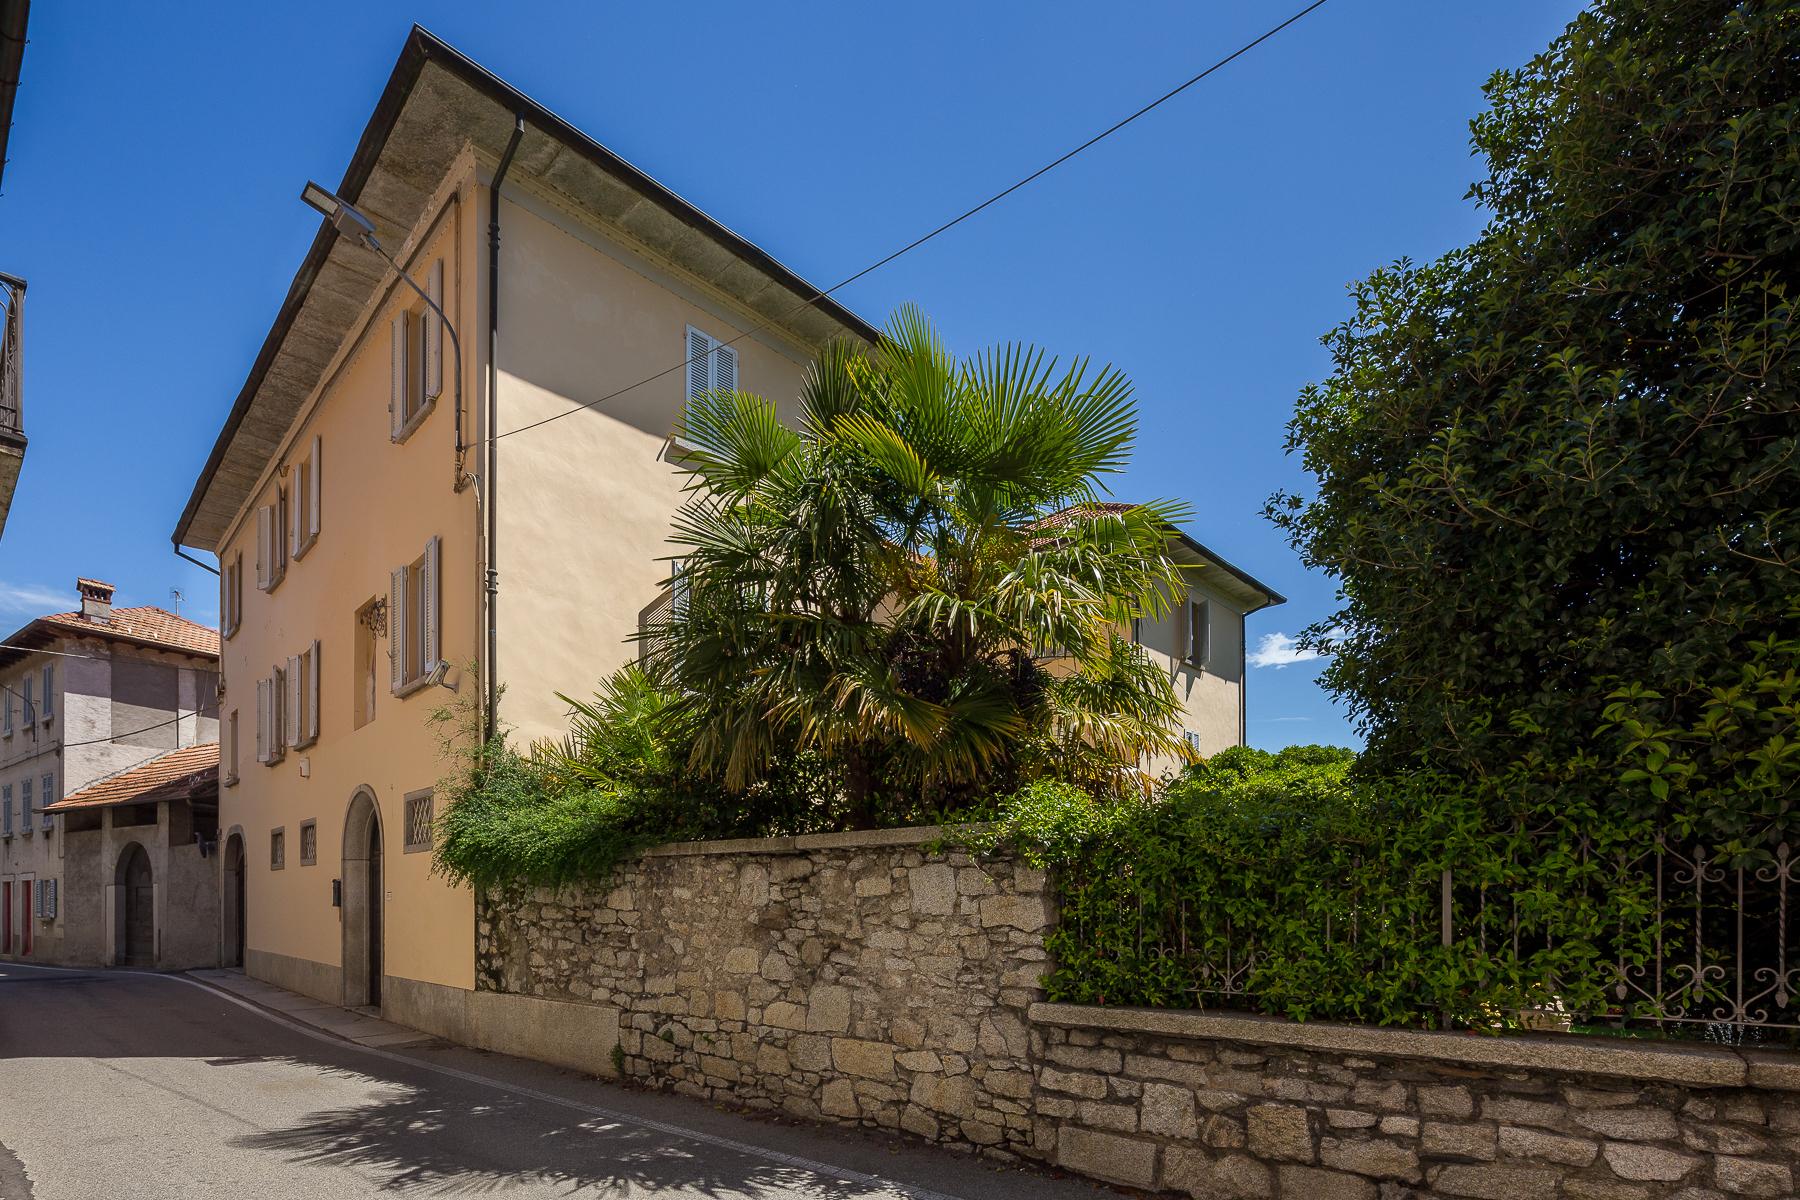 Casa indipendente in Vendita a Pella: 5 locali, 292 mq - Foto 23